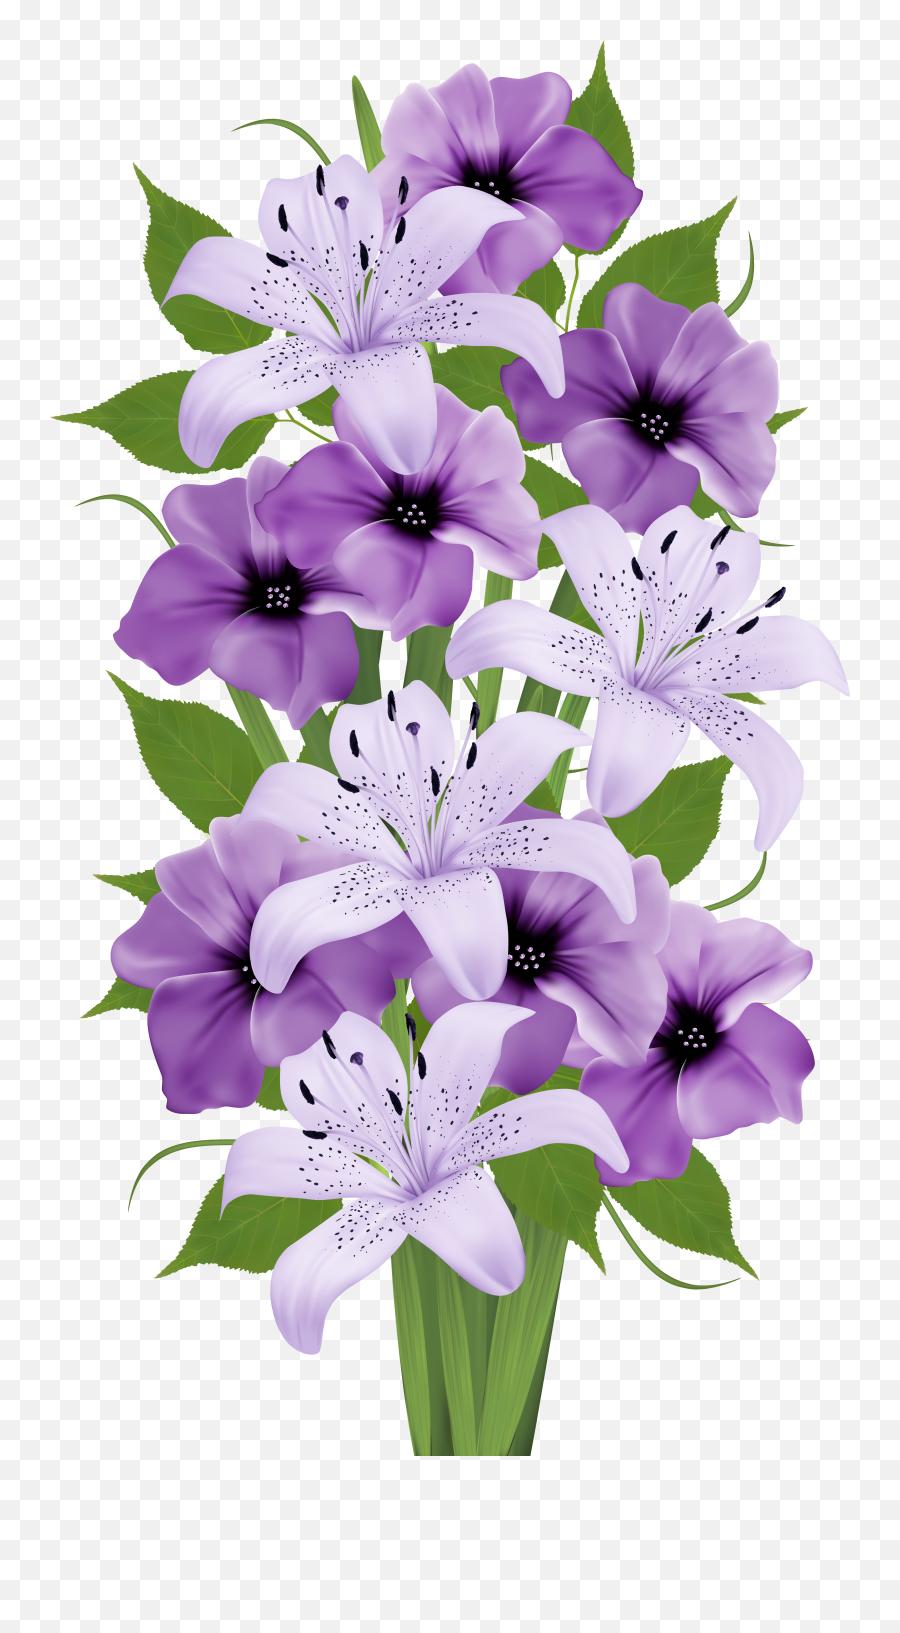 Library Of Flower Bouquet Border Png Beautiful Flowers Bouquet Hd Emoji Boquet Emoji Free Transparent Emoji Emojipng Com